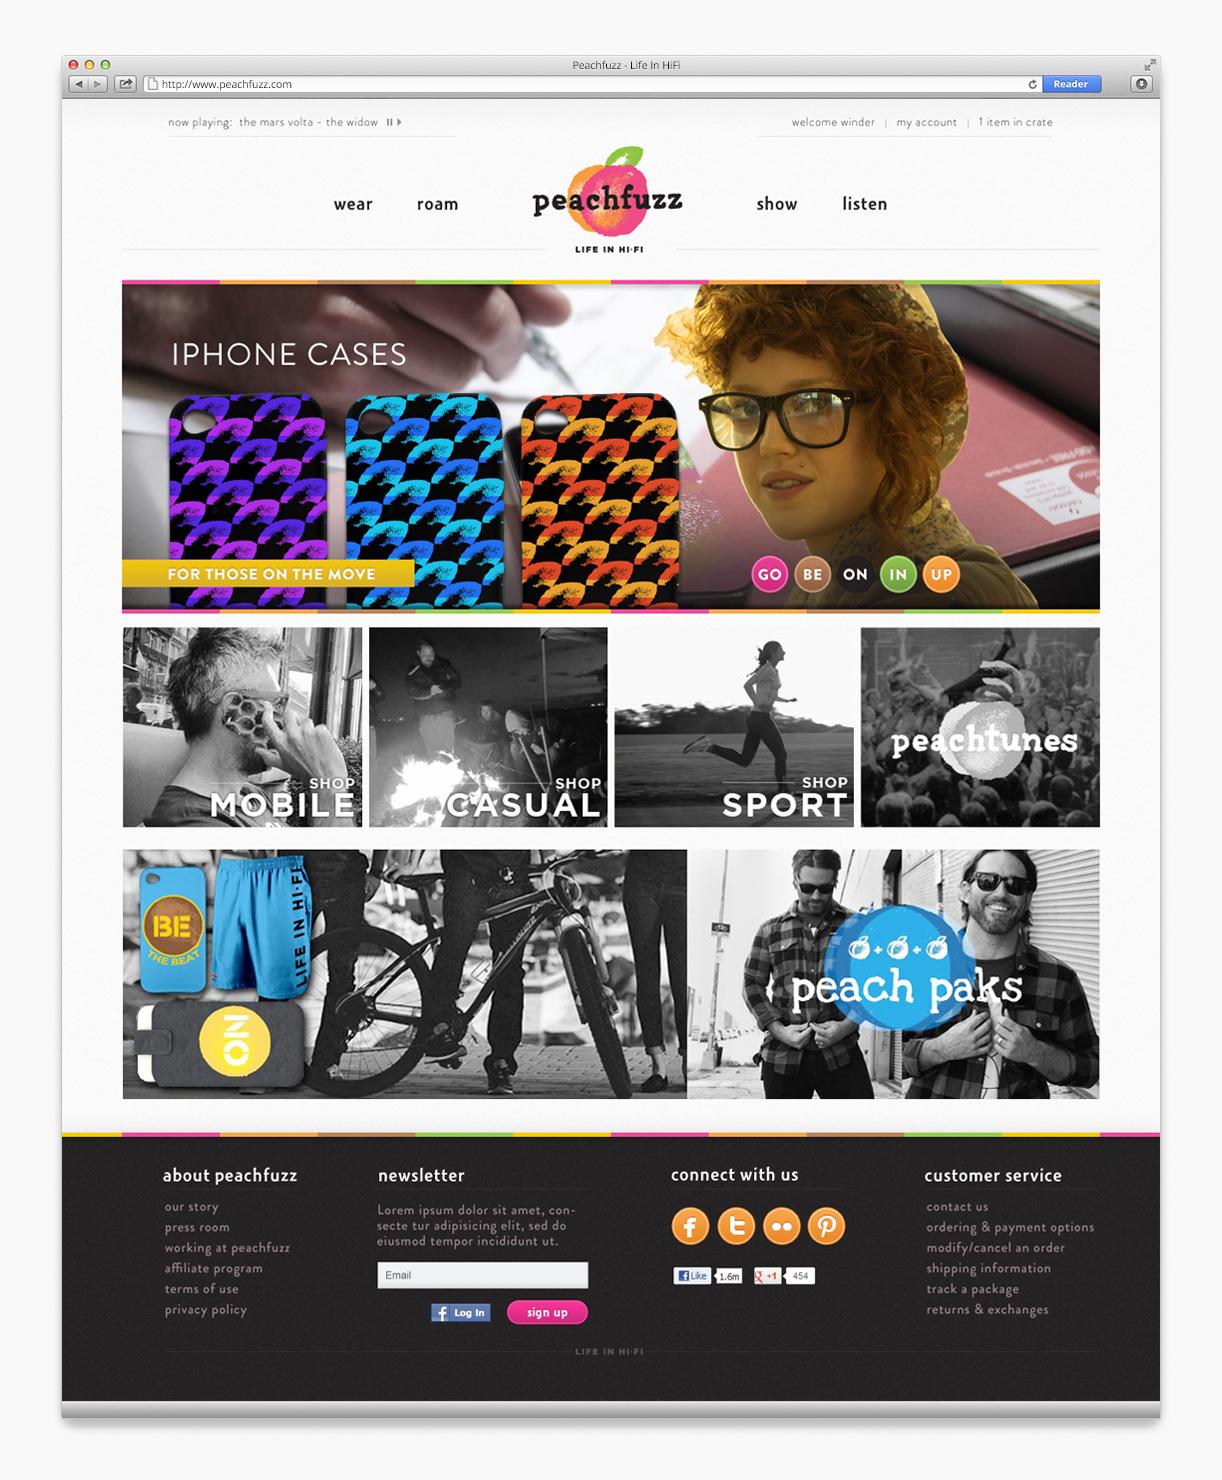 interactive_lifeinhifi_image10